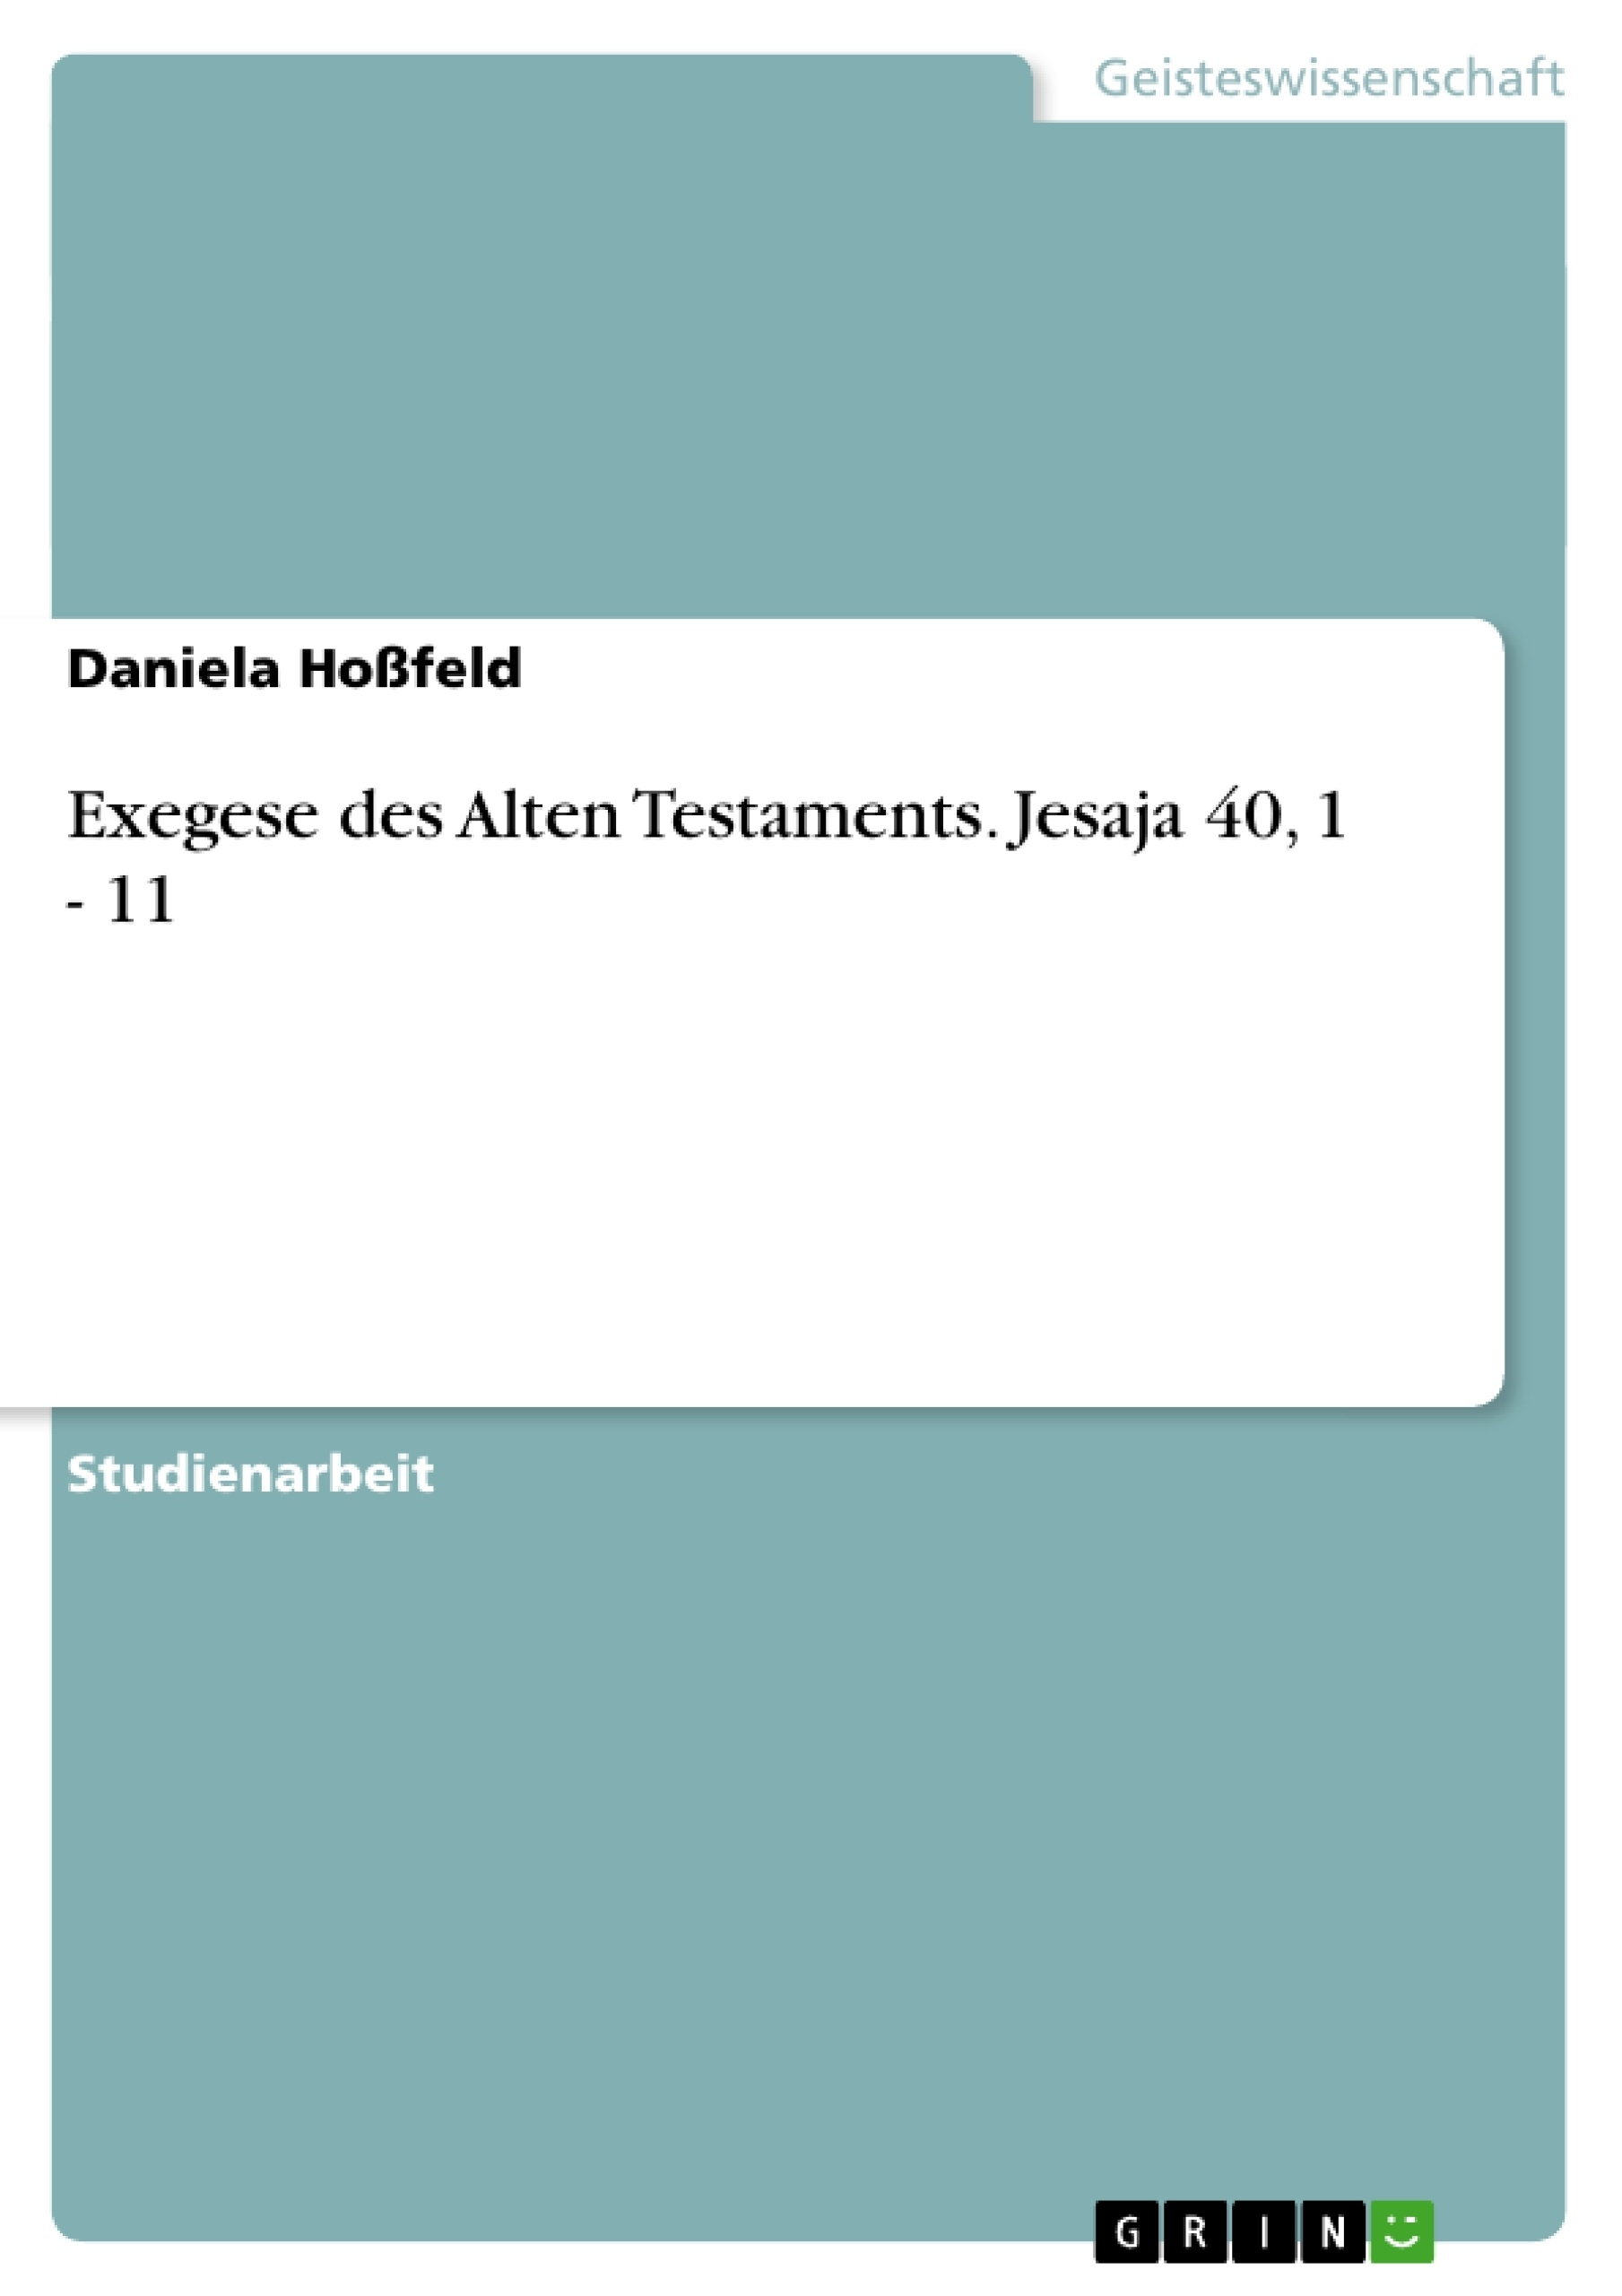 Titel: Exegese des Alten Testaments. Jesaja 40, 1 - 11